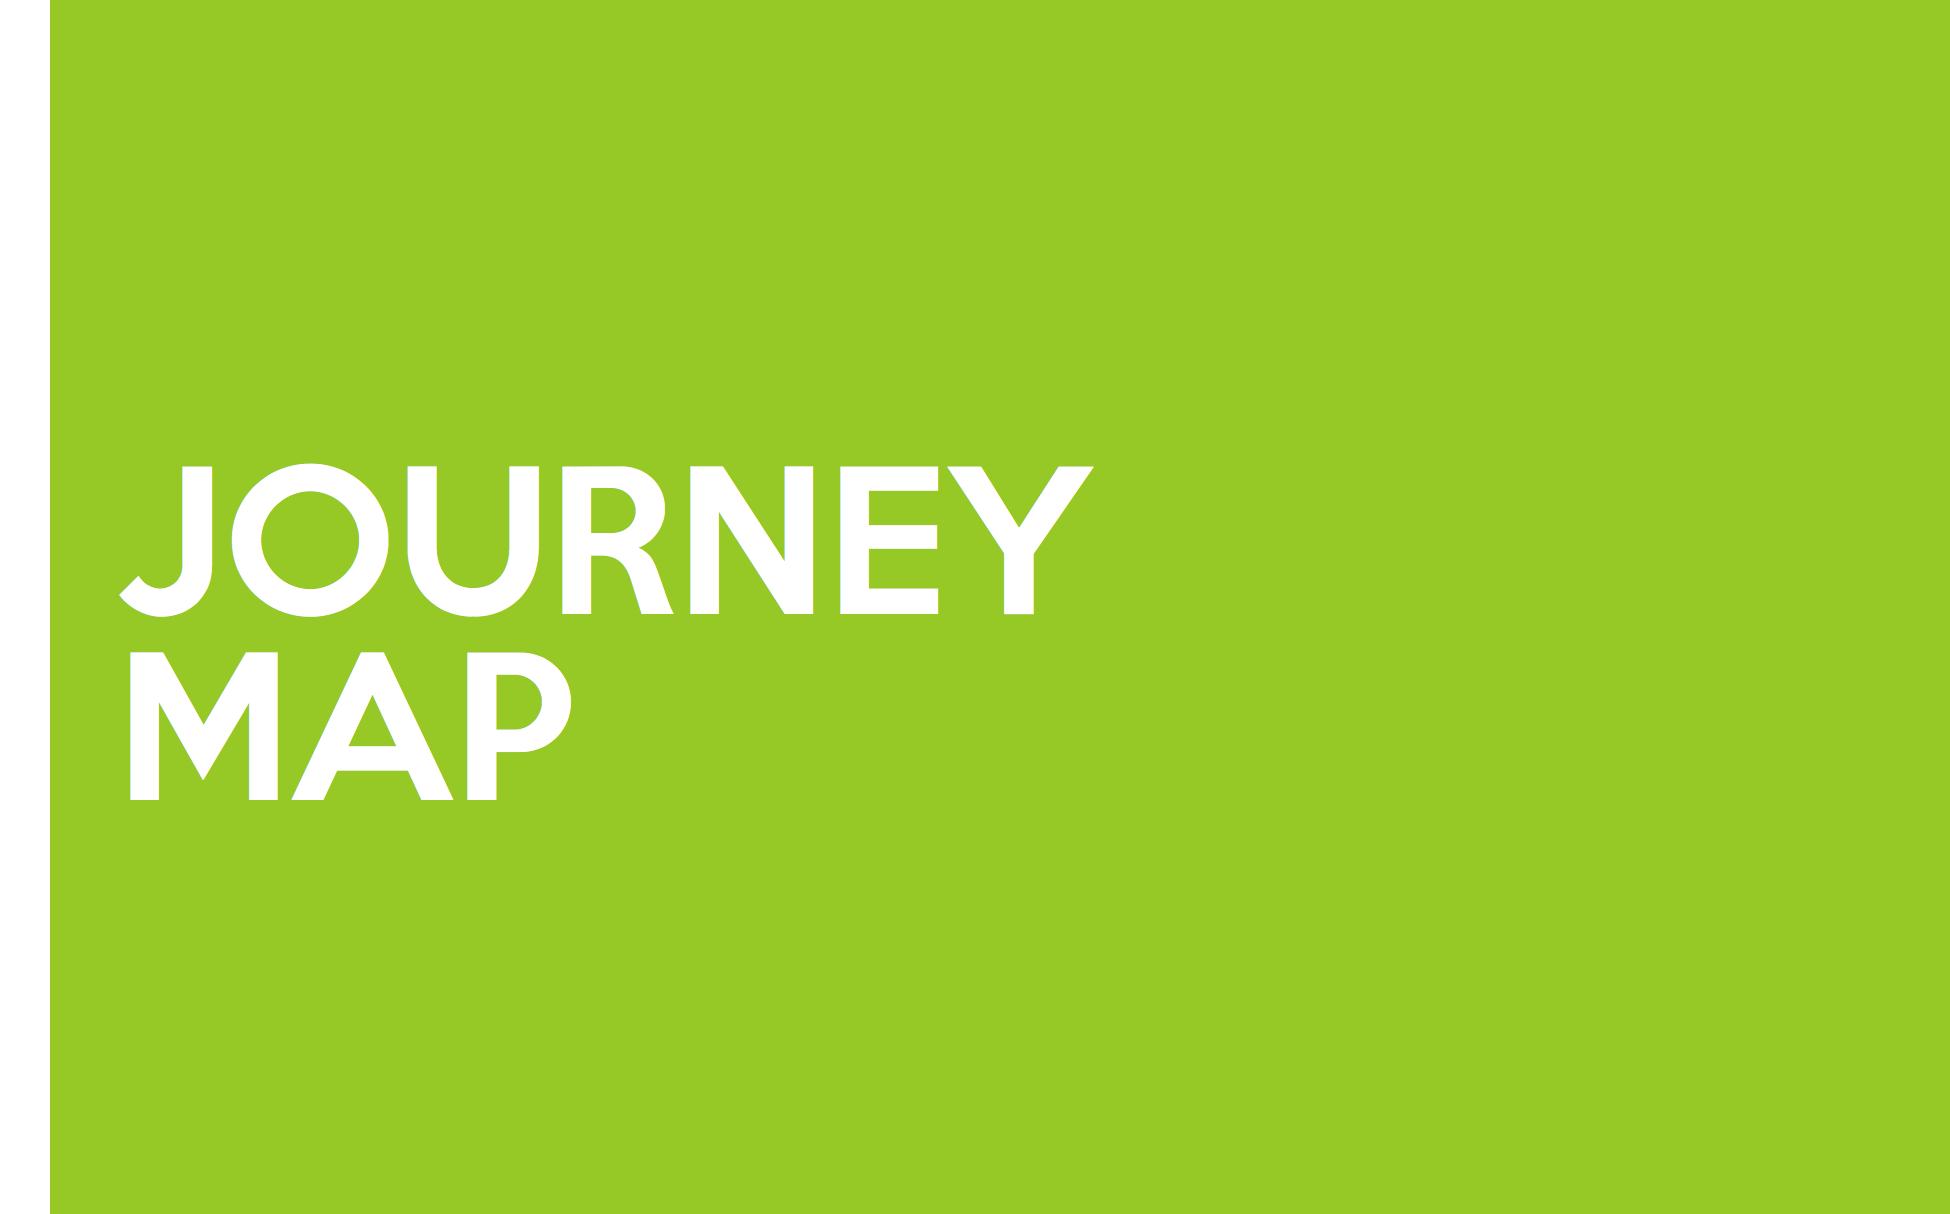 Journey Map